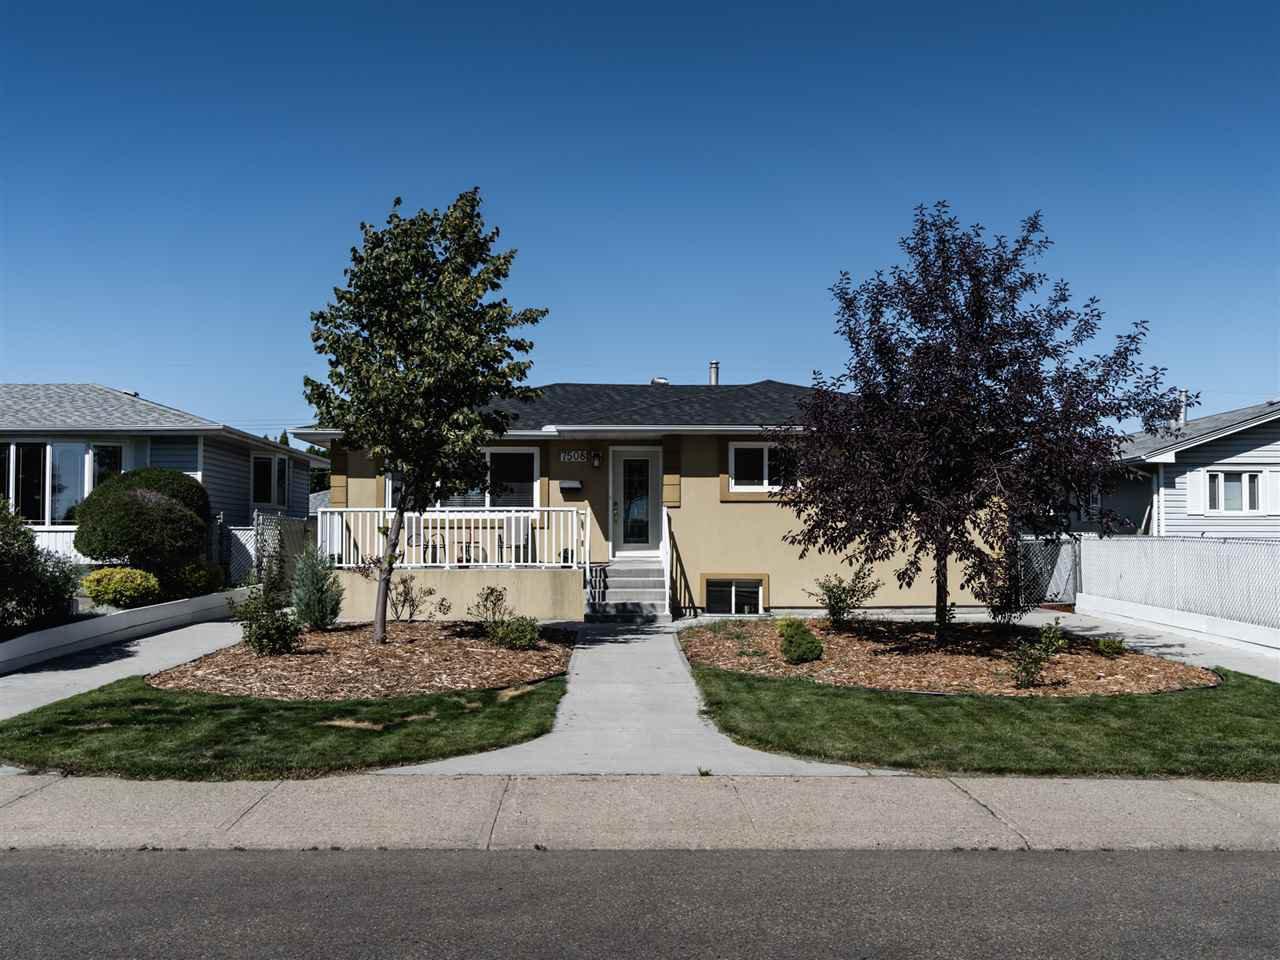 Main Photo: 7508 129A Avenue in Edmonton: Zone 02 House for sale : MLS®# E4211694